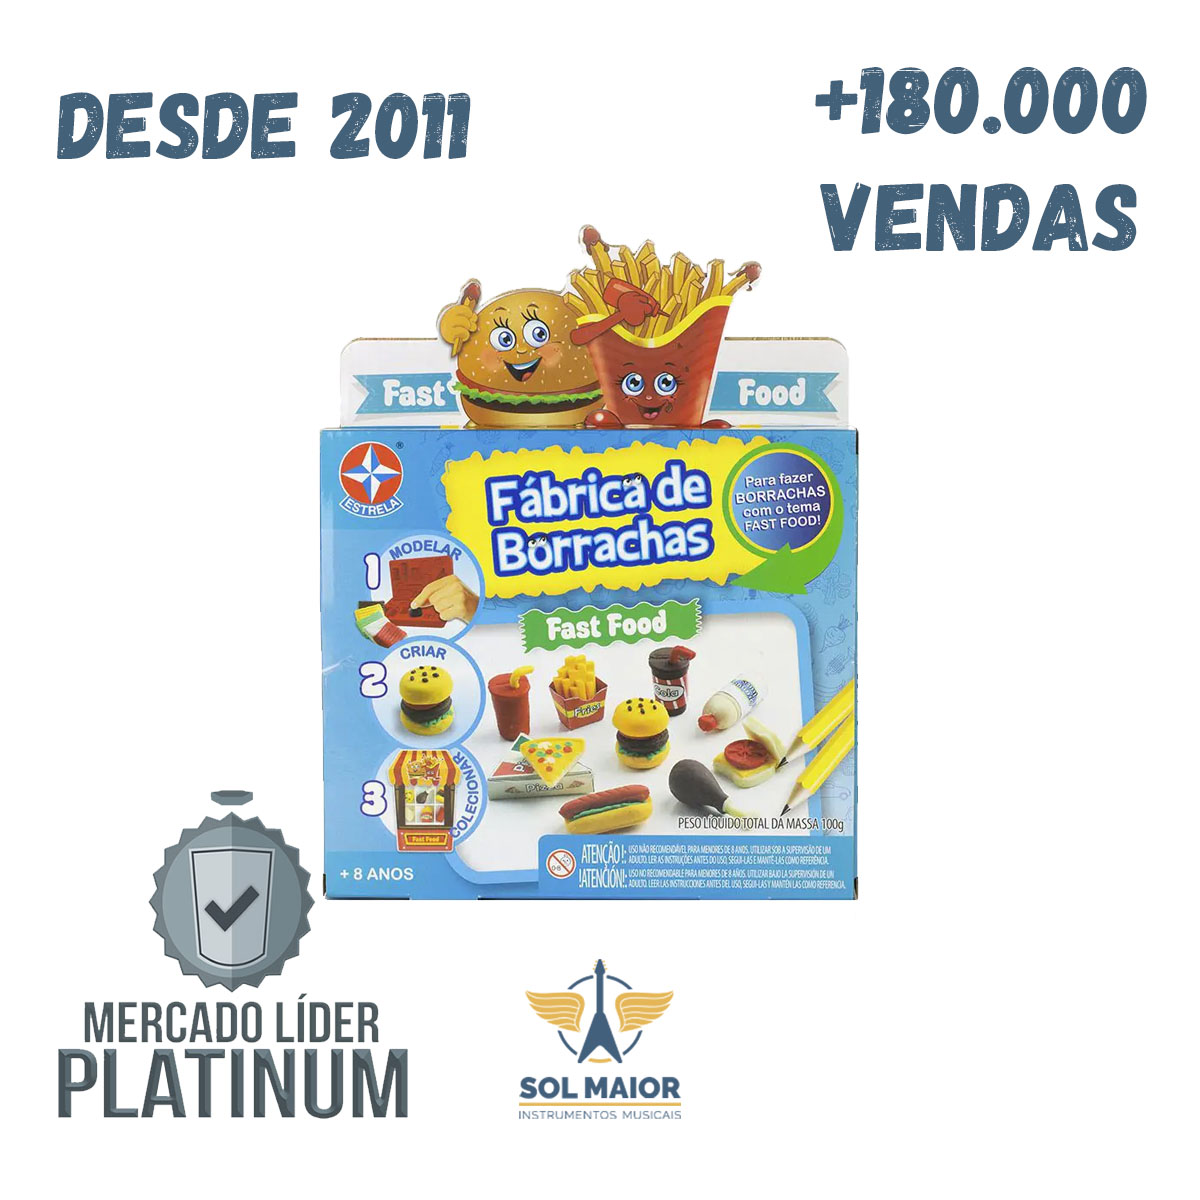 Brinquedo Infantil Fabrica De Borrachas Fast Food - Estrela